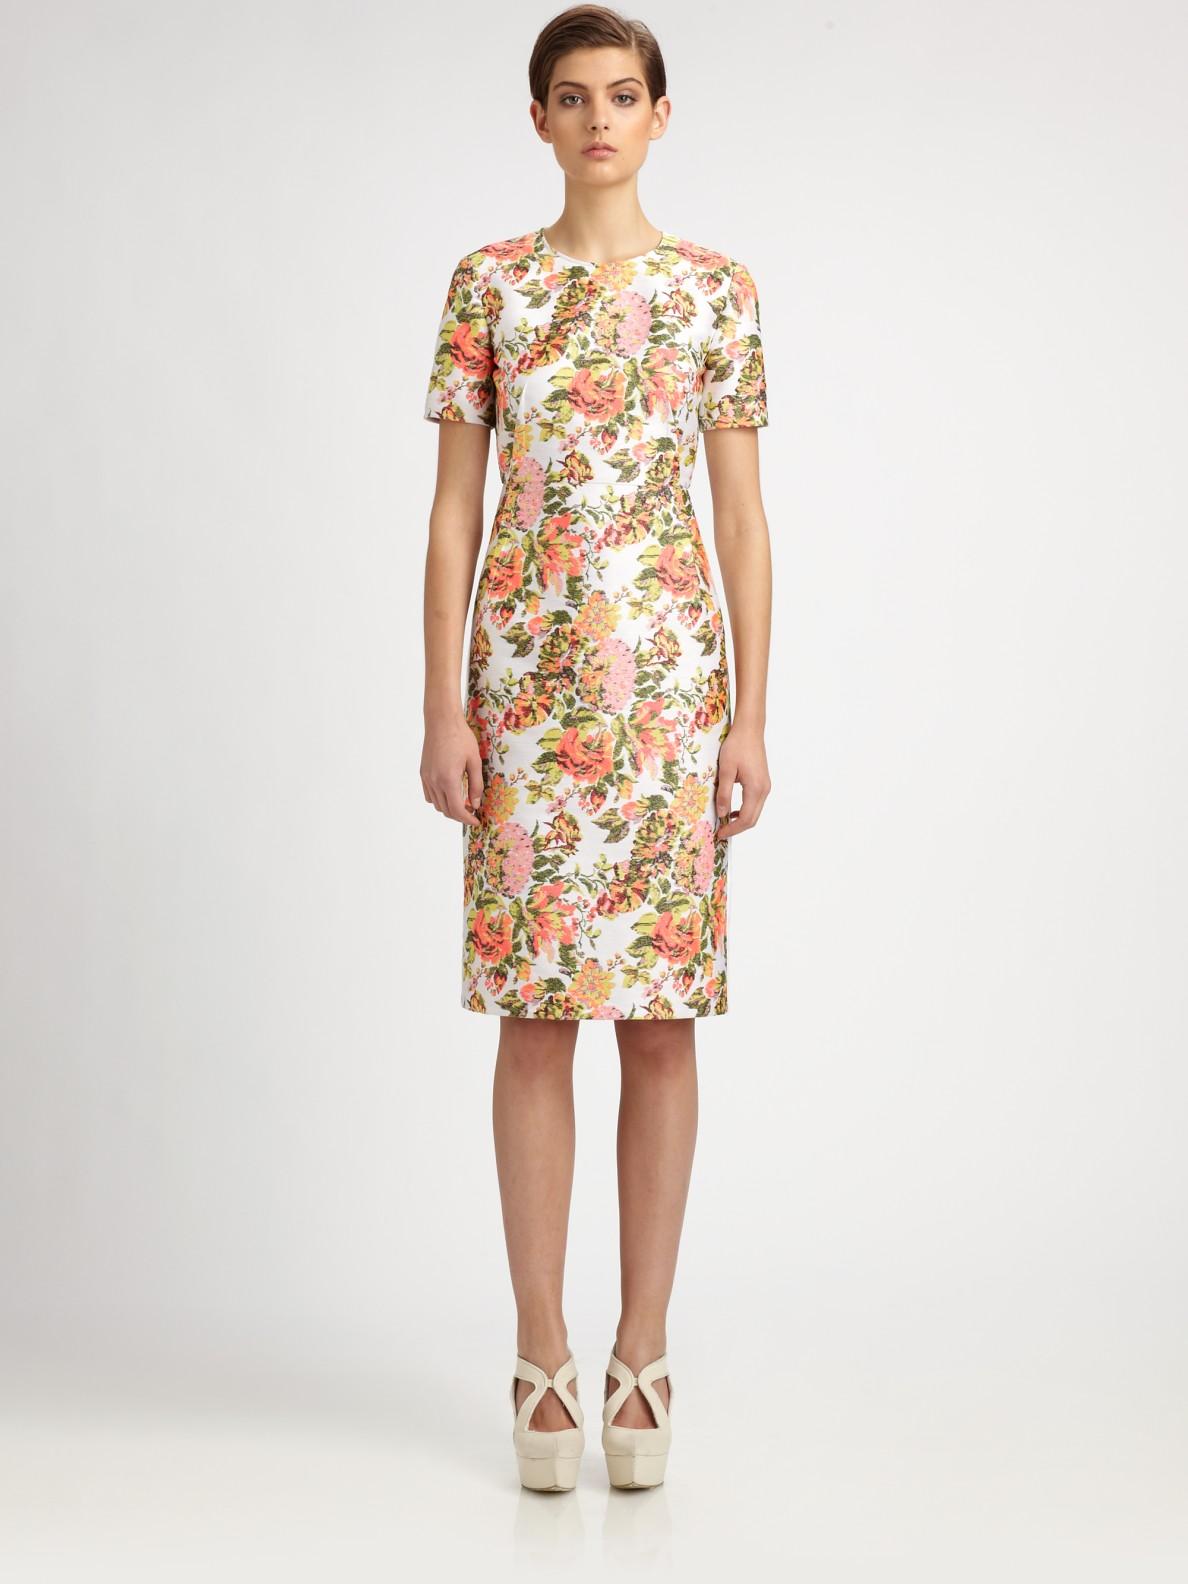 250cab7e6068 Lyst - Stella McCartney Floral Jacquard Dress in Pink